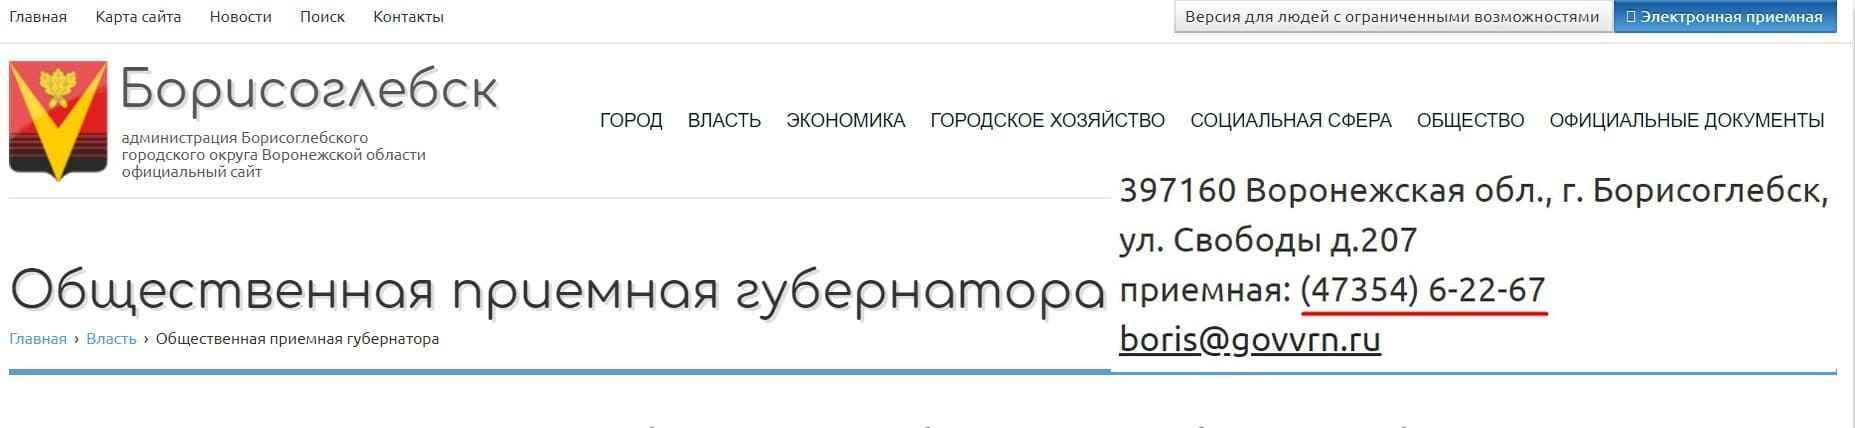 Борисоглебск администрация сайт